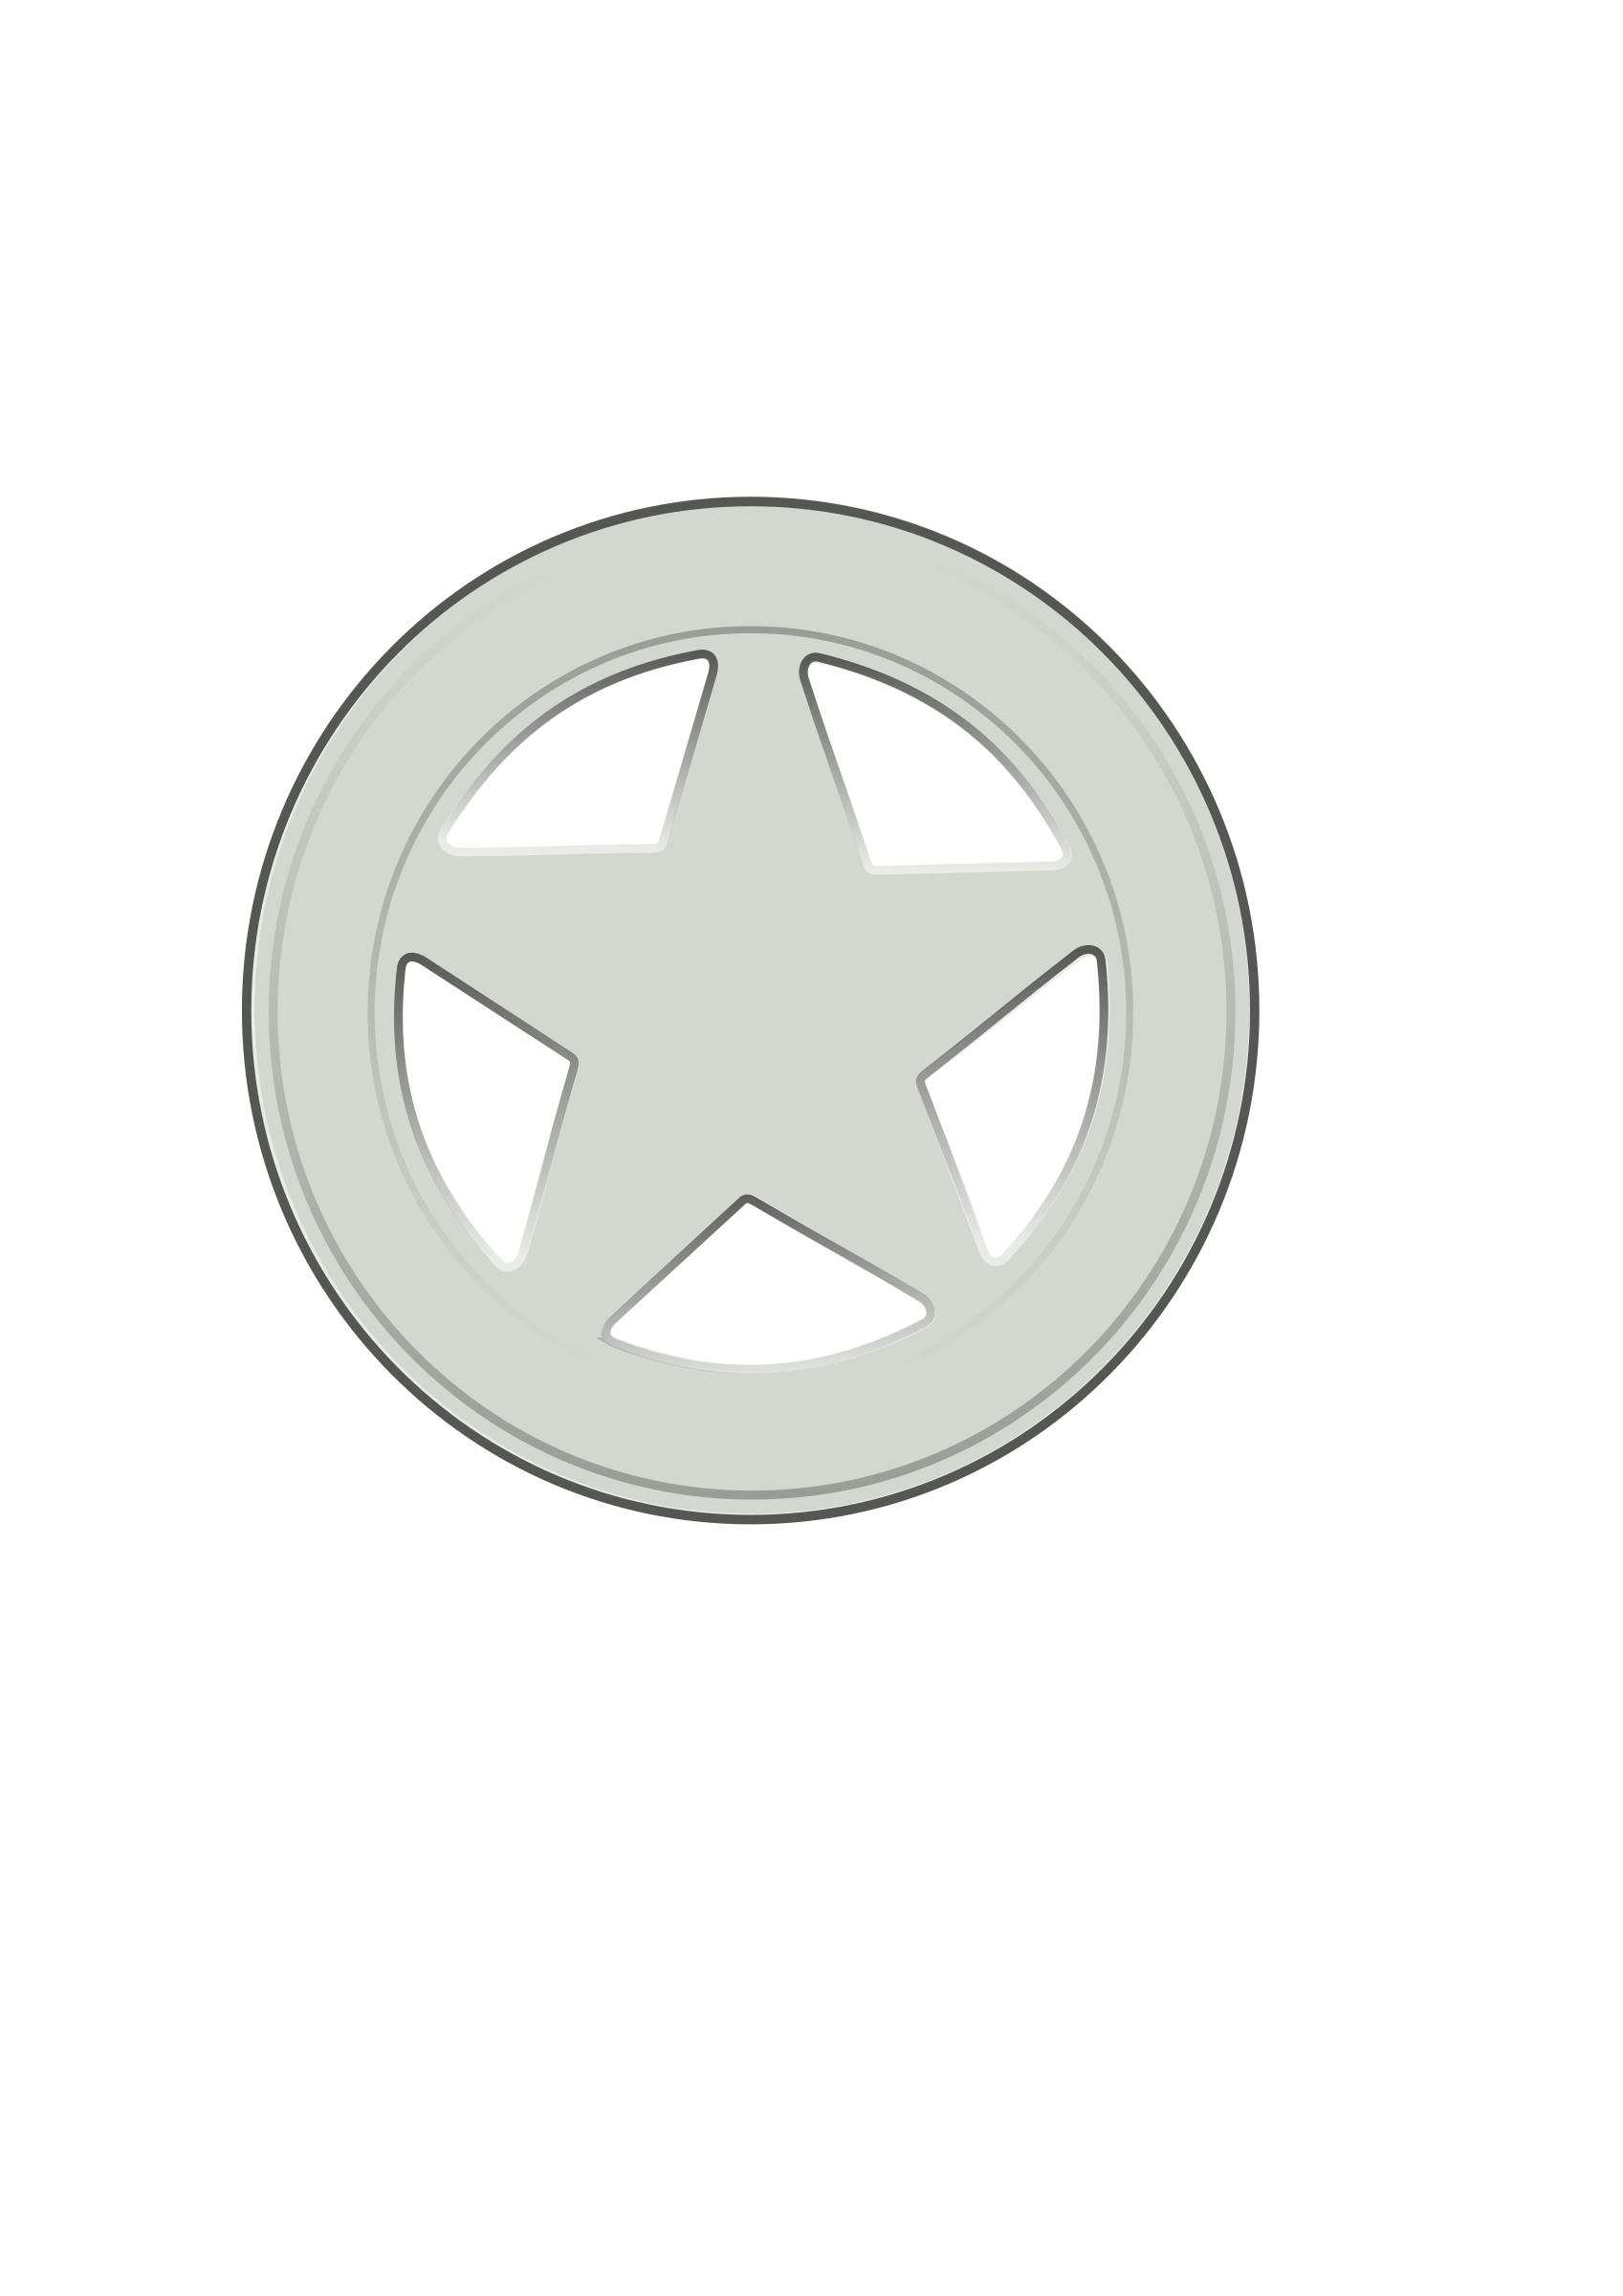 Converse clipart icon. Sheriff badge big image